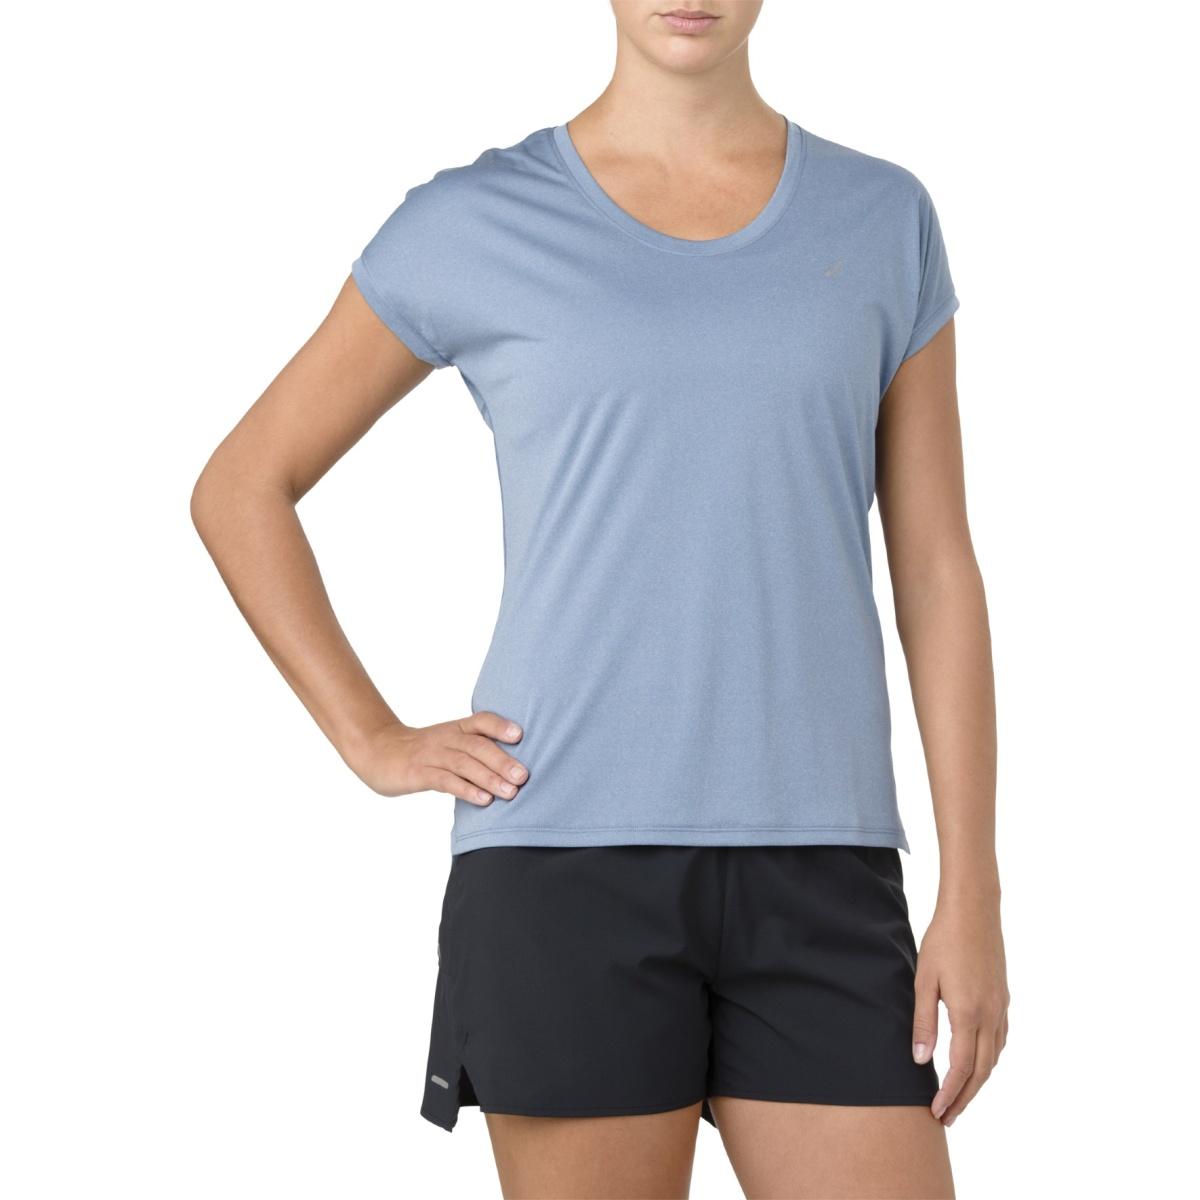 Asics Shirt Capsleeve 2018 blau Damen versandkostenfrei